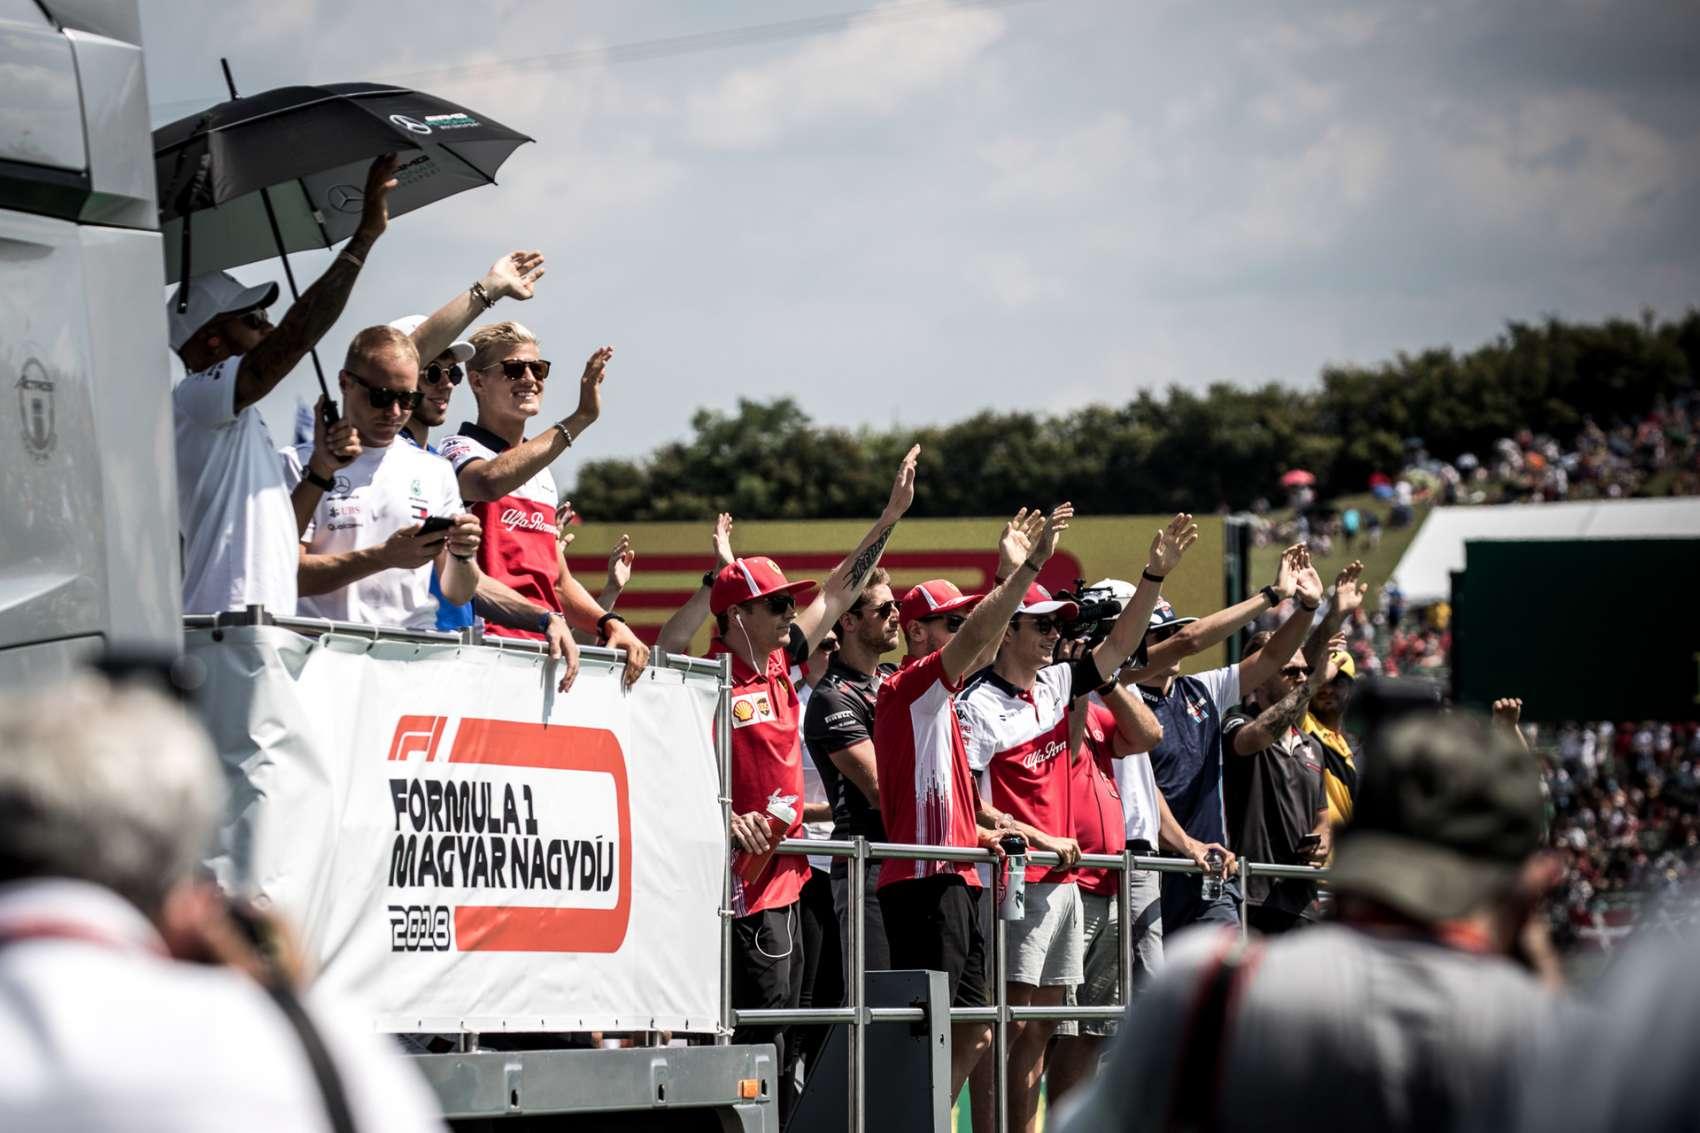 F1, csapattárs, Racingline